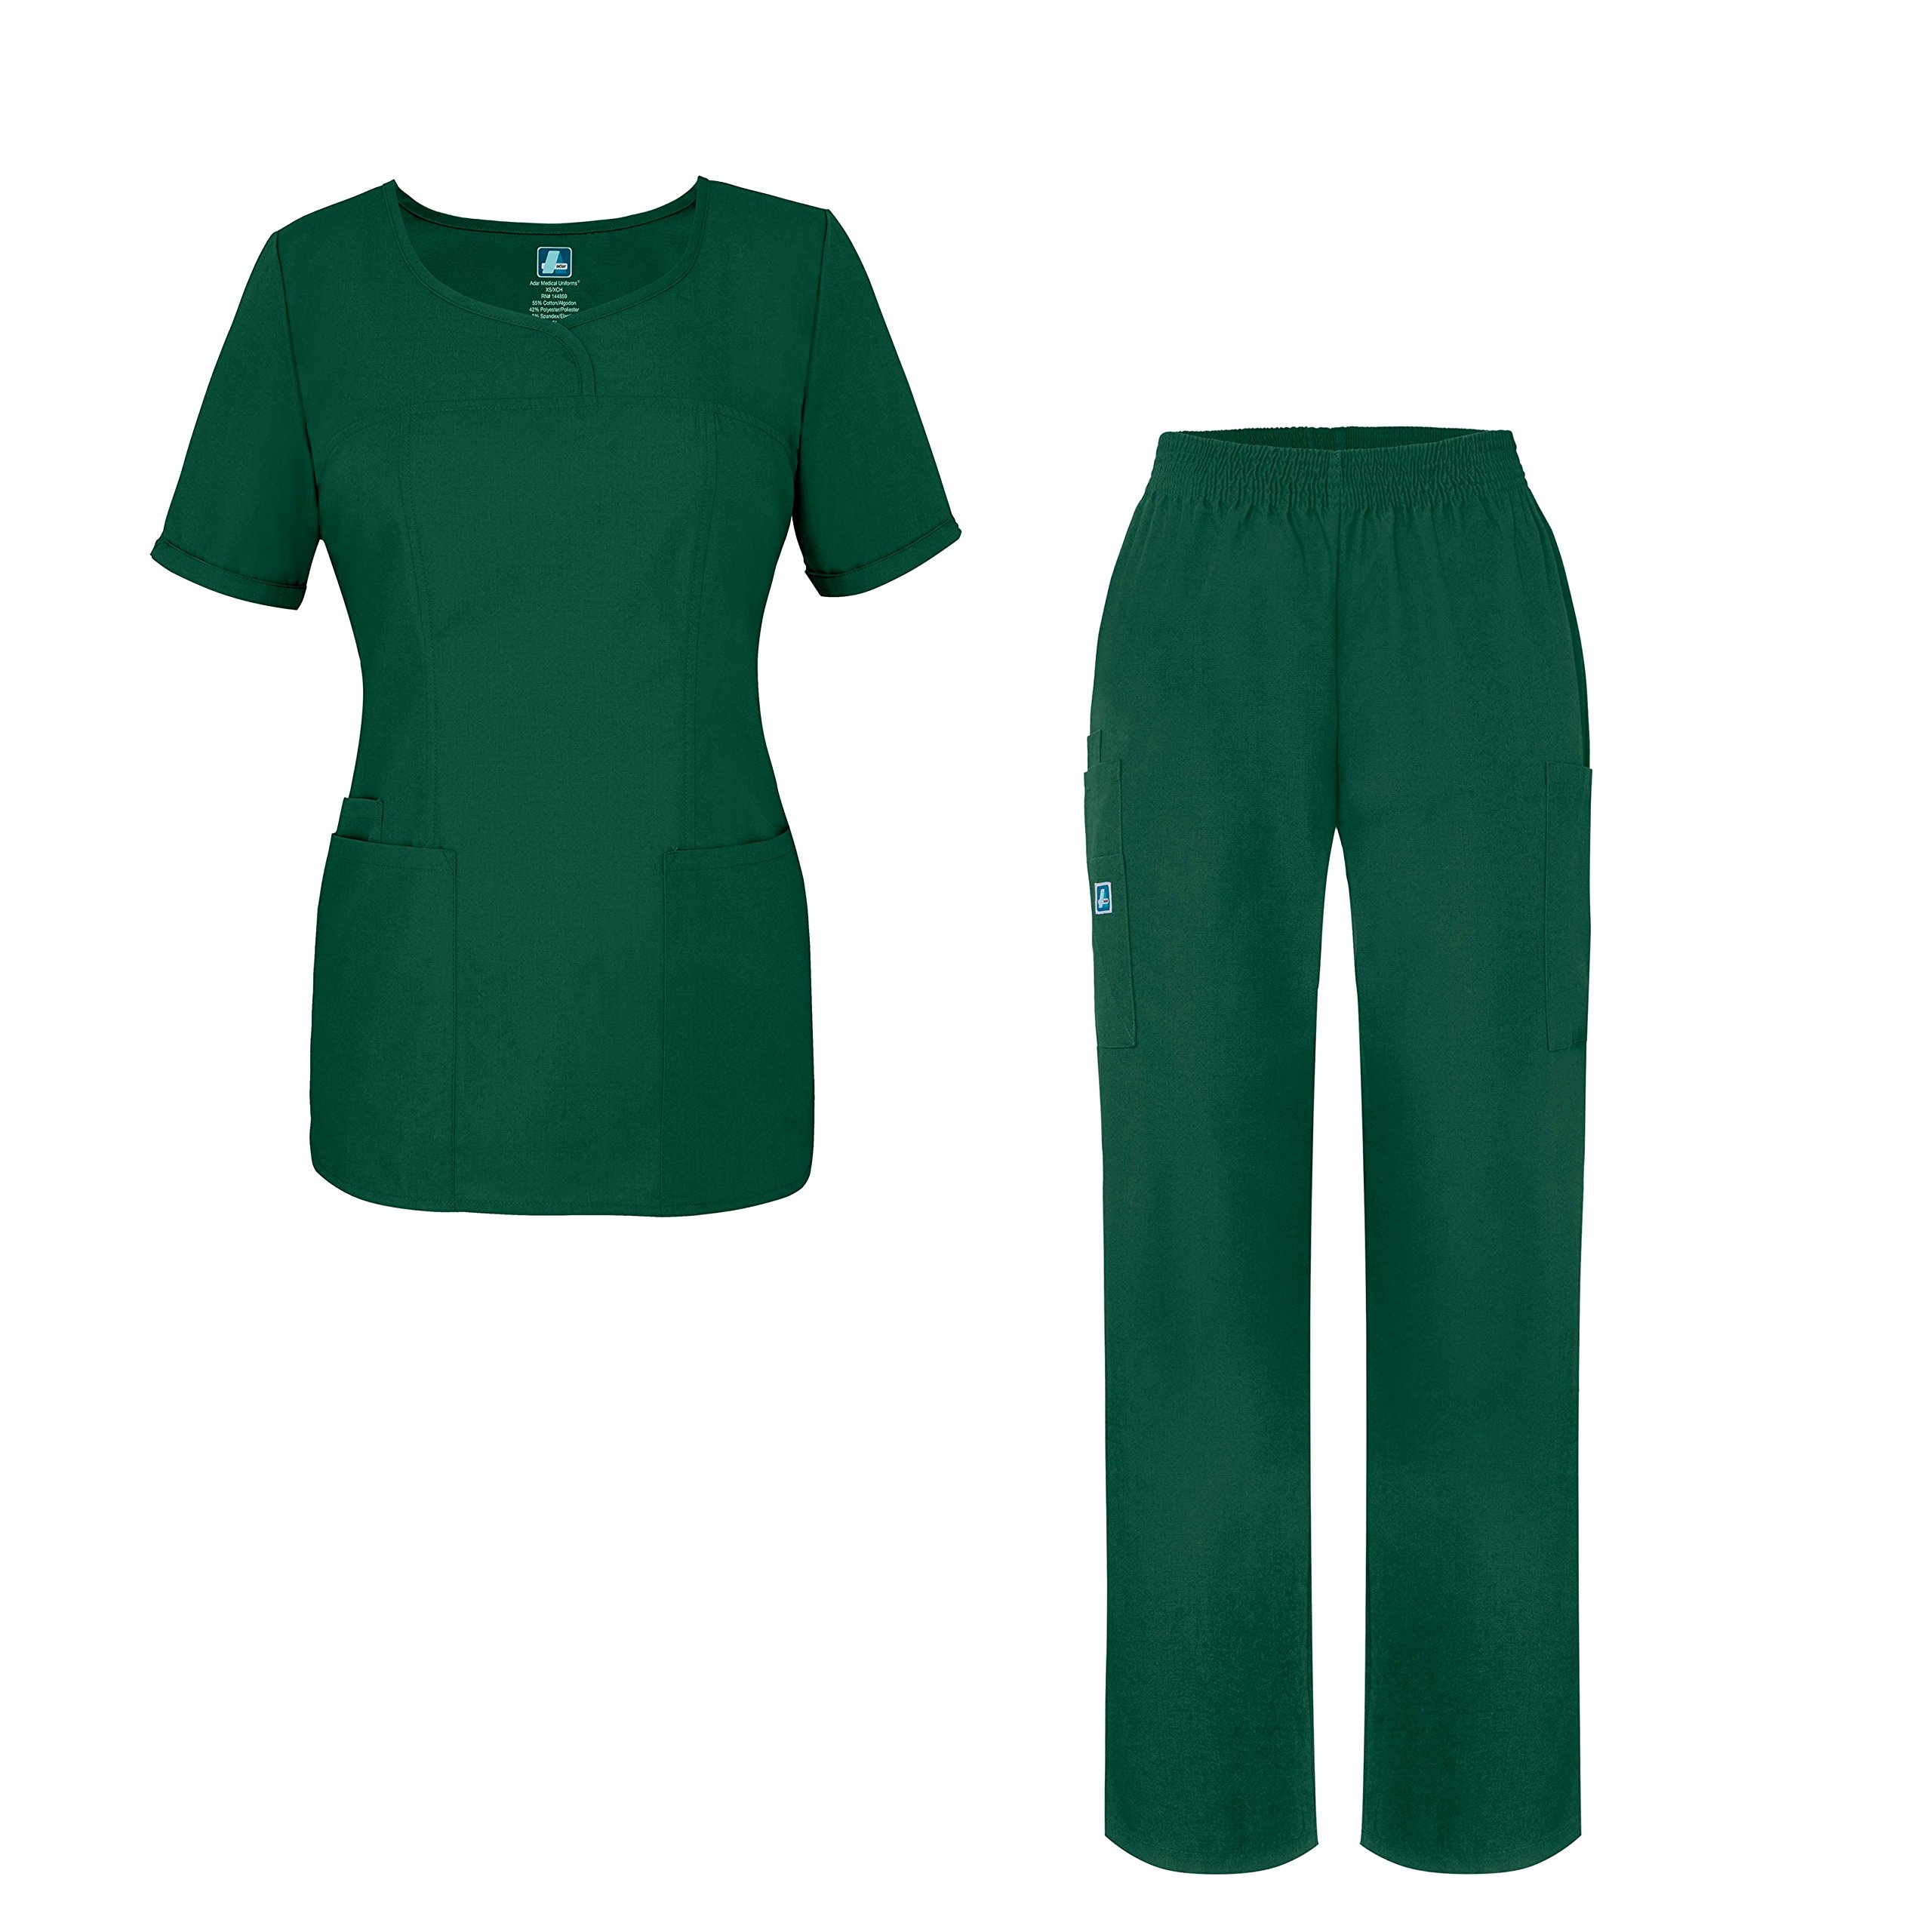 Universal Women's Scrub Set - V-Neck Scrub Top and Elastic Pull-On Scrub Pants - 901 - Hunter Green - S